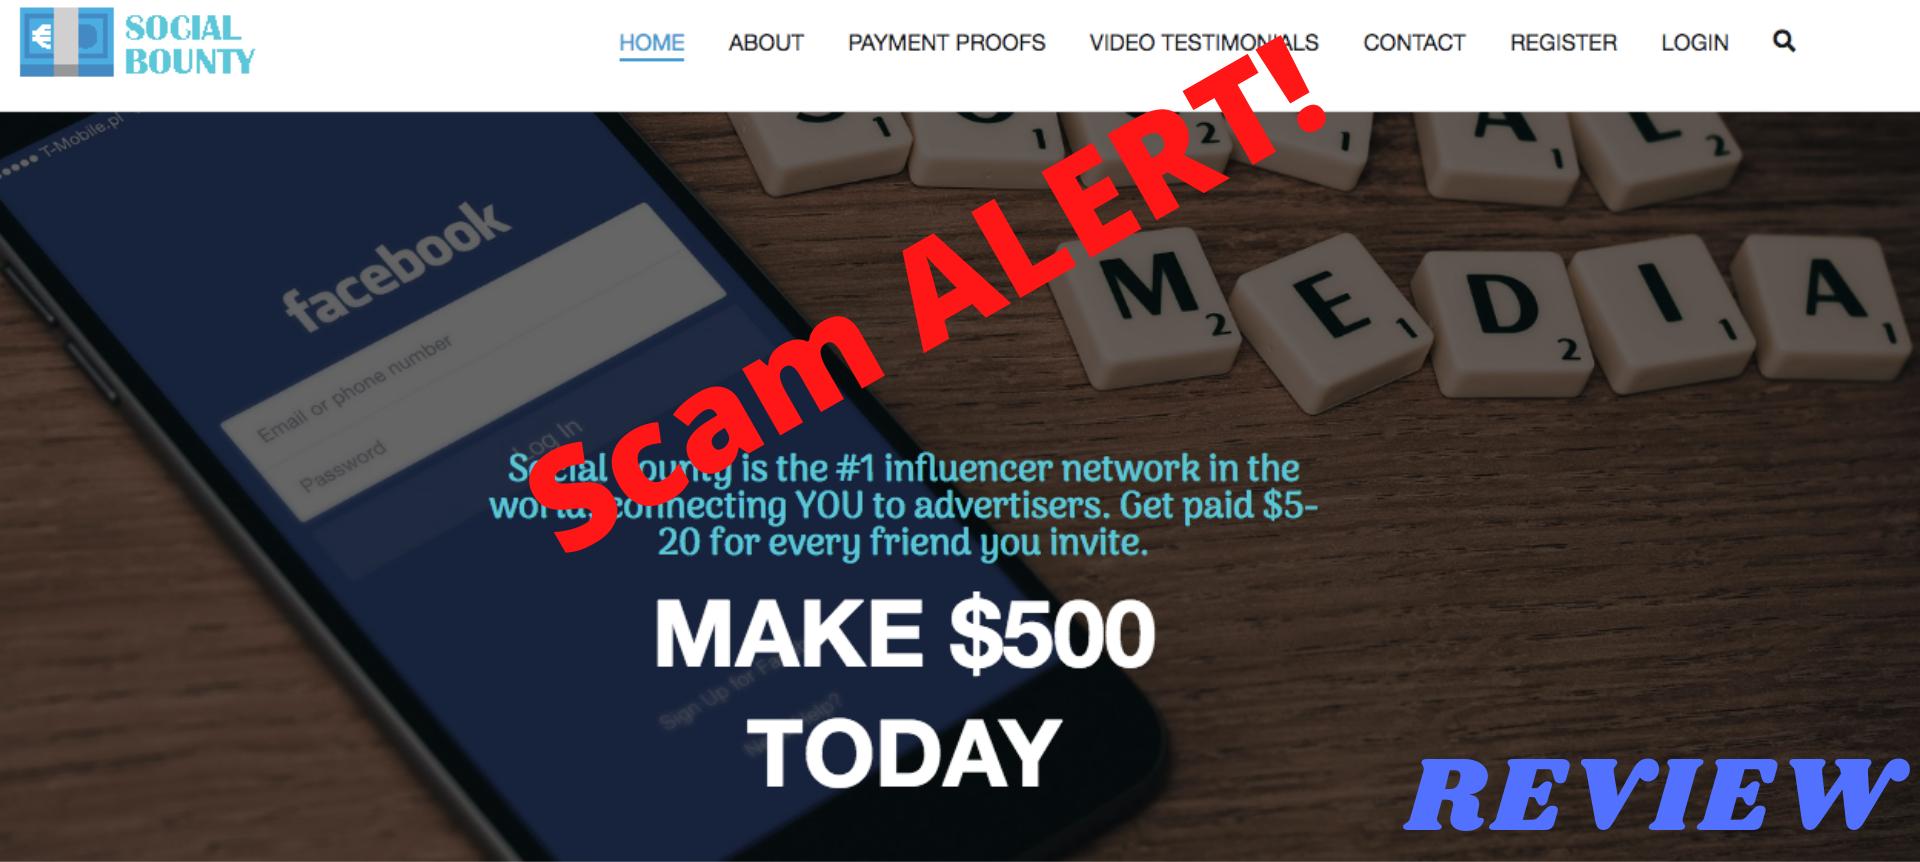 Social bounty review: Scam Alert